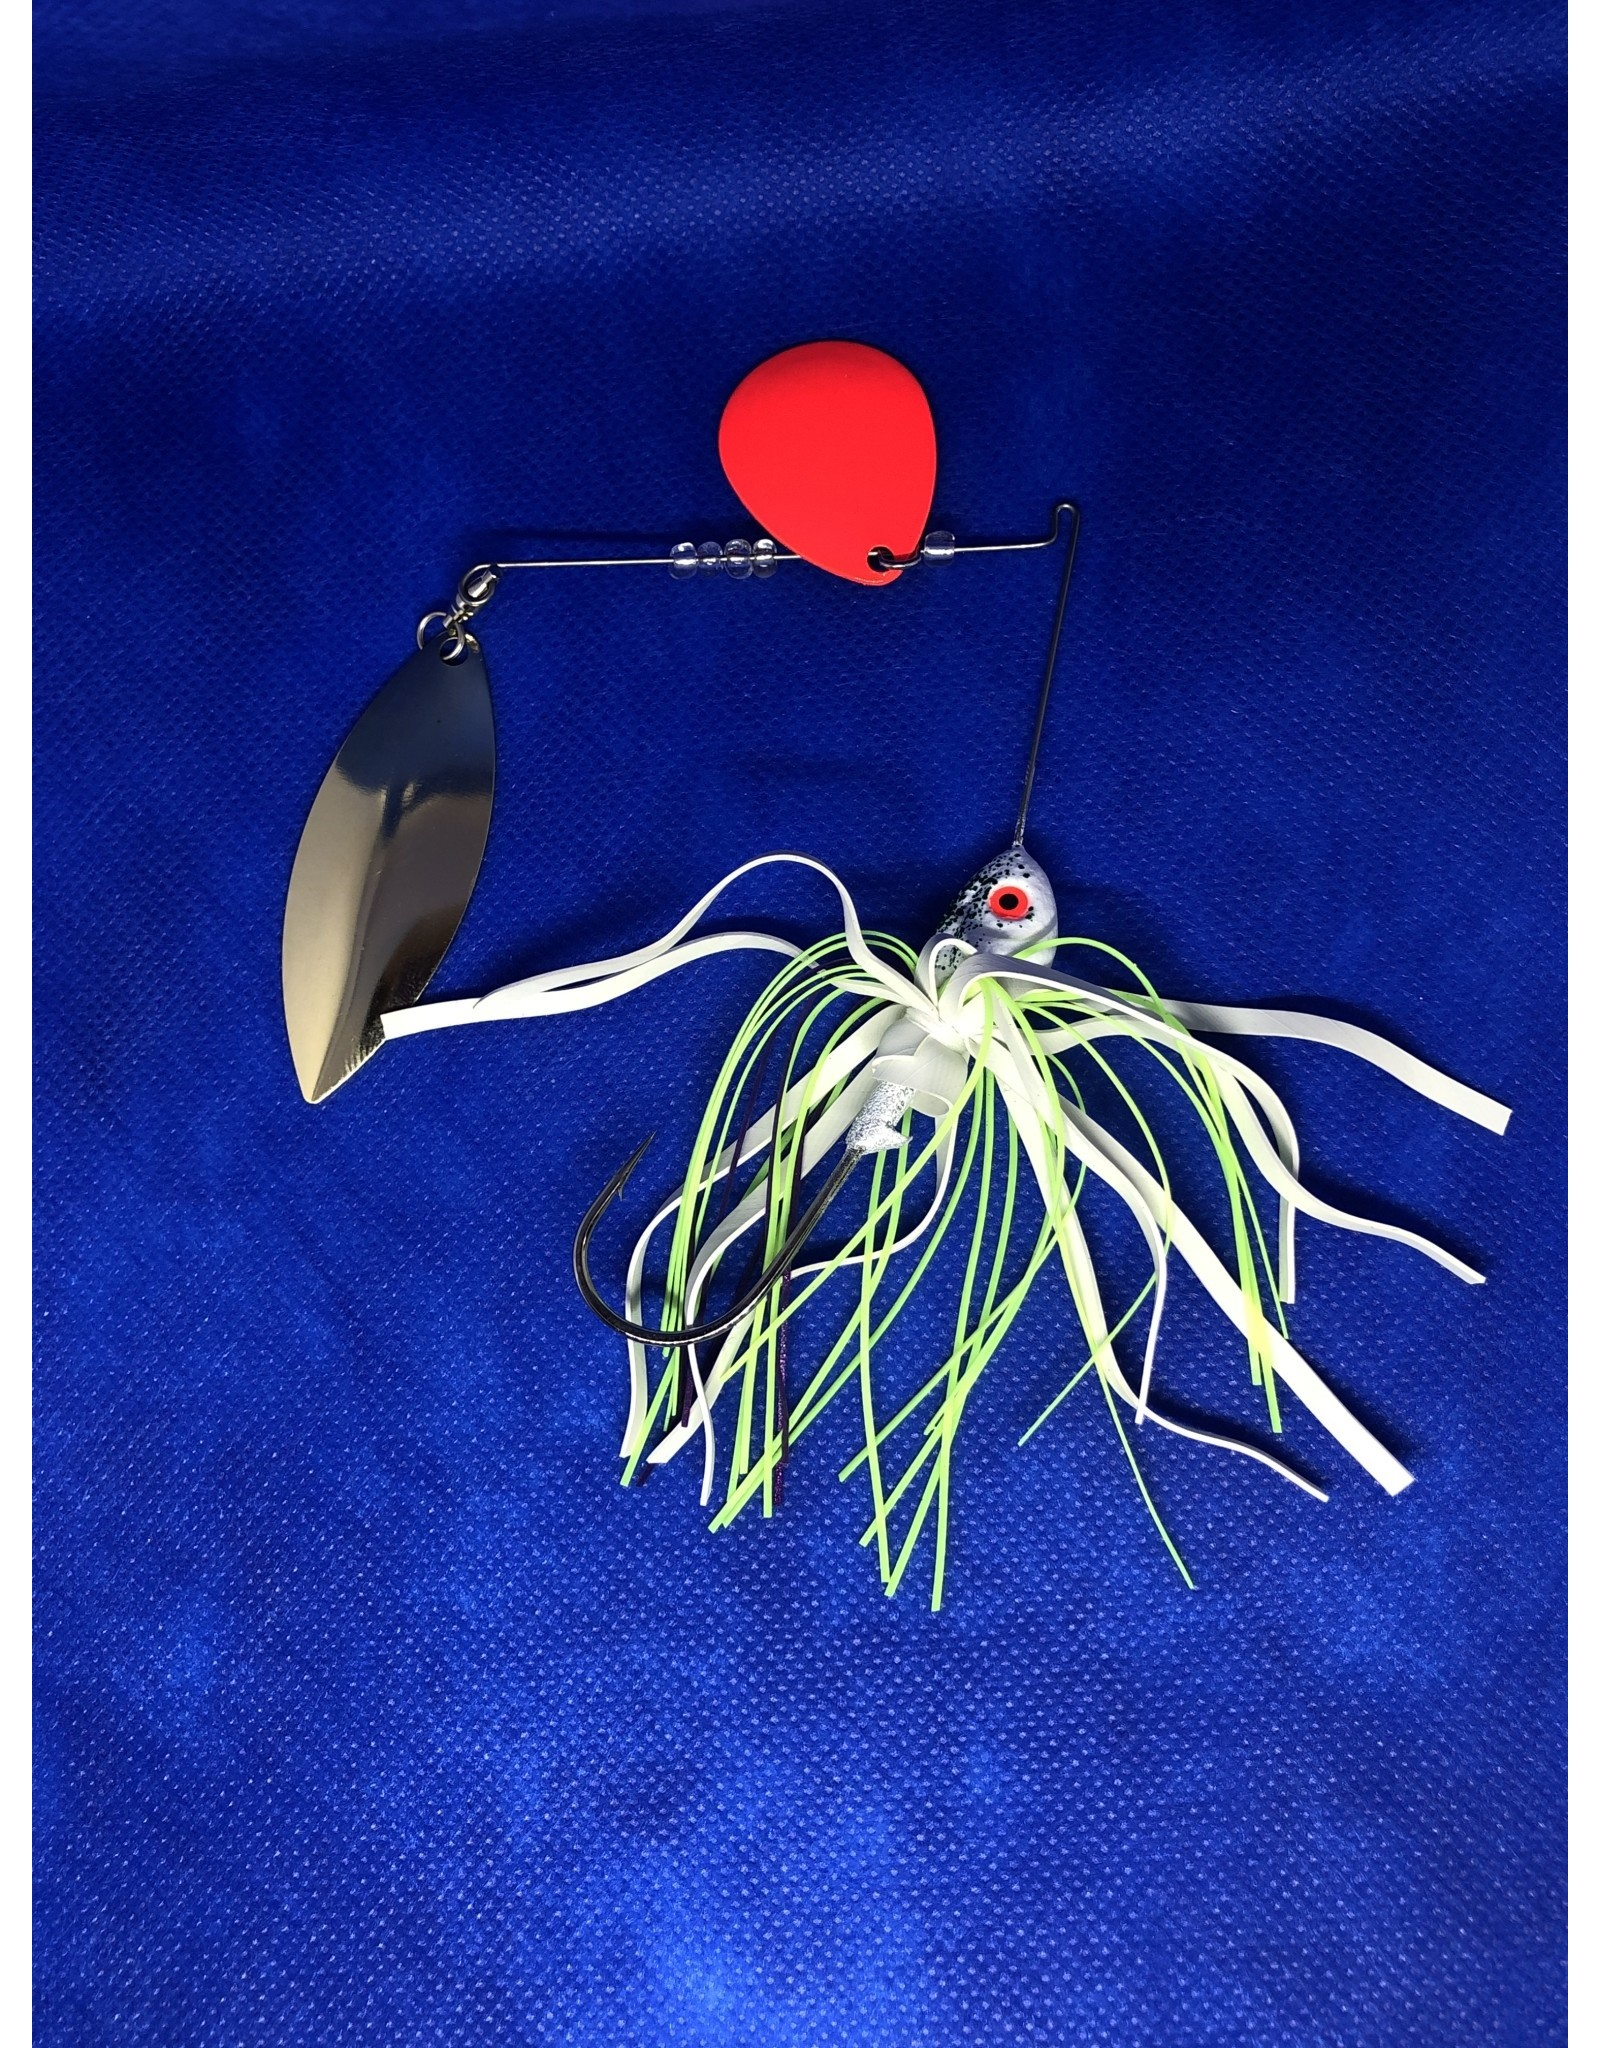 Yank-um Yank-um Tablerock Spinnerbait - Red/Willow